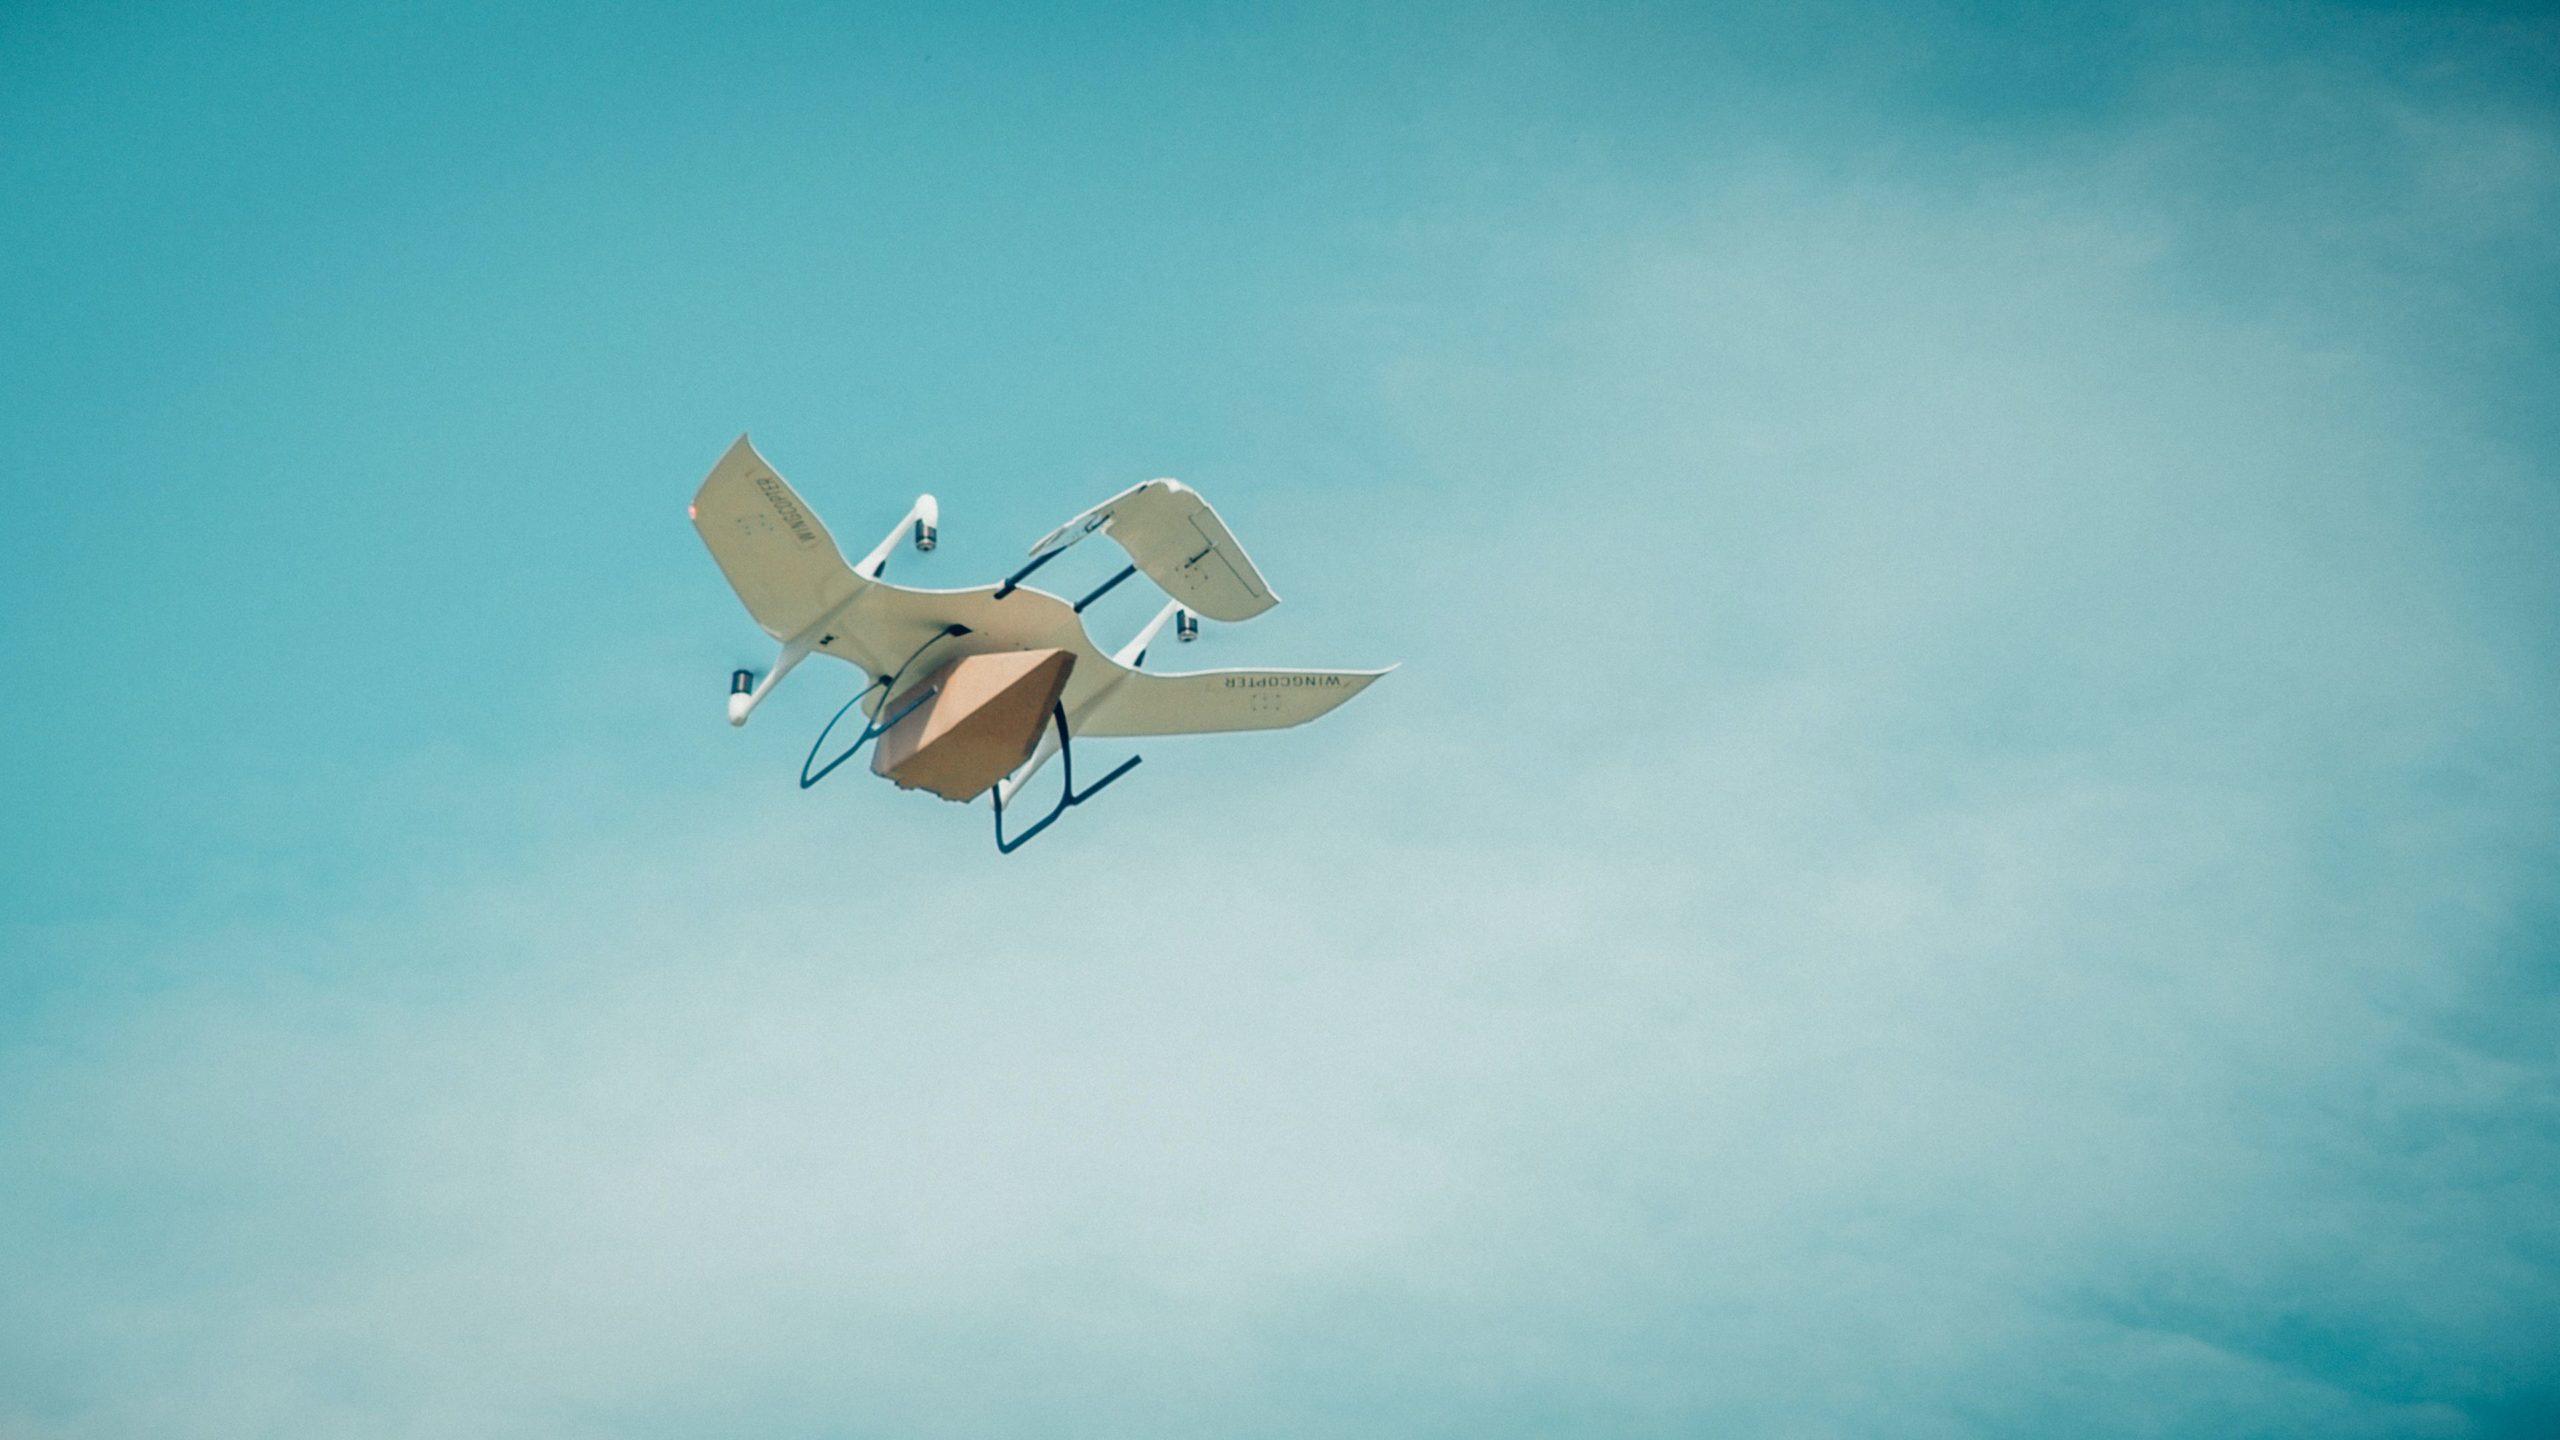 Wingcopter_MVLD_Key Visual_komprimiert